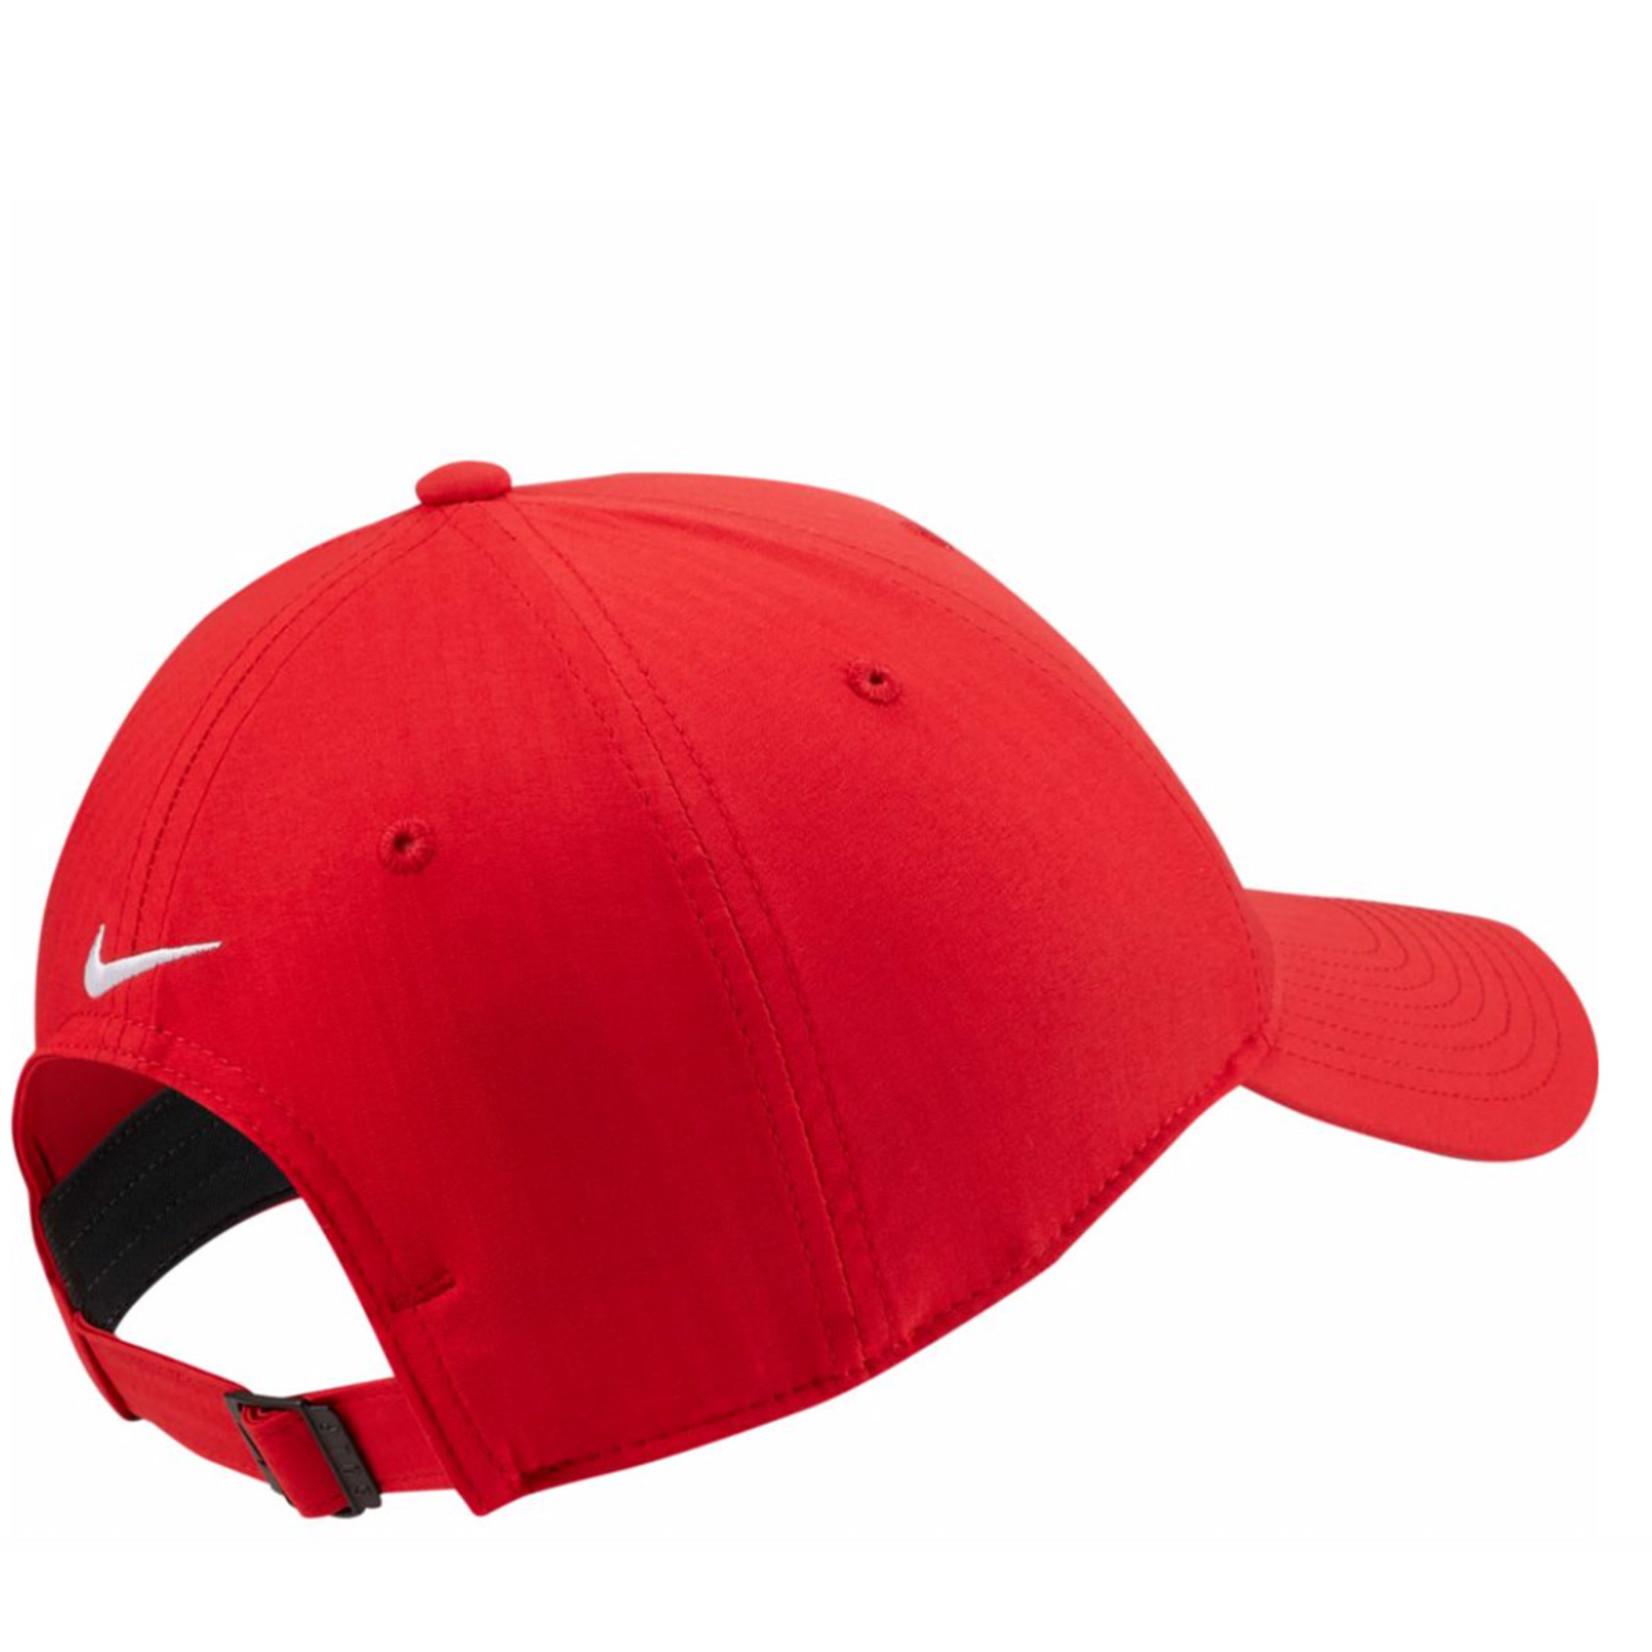 NIKE VARDAR LEGACY 91 ADJUSTABLE HAT